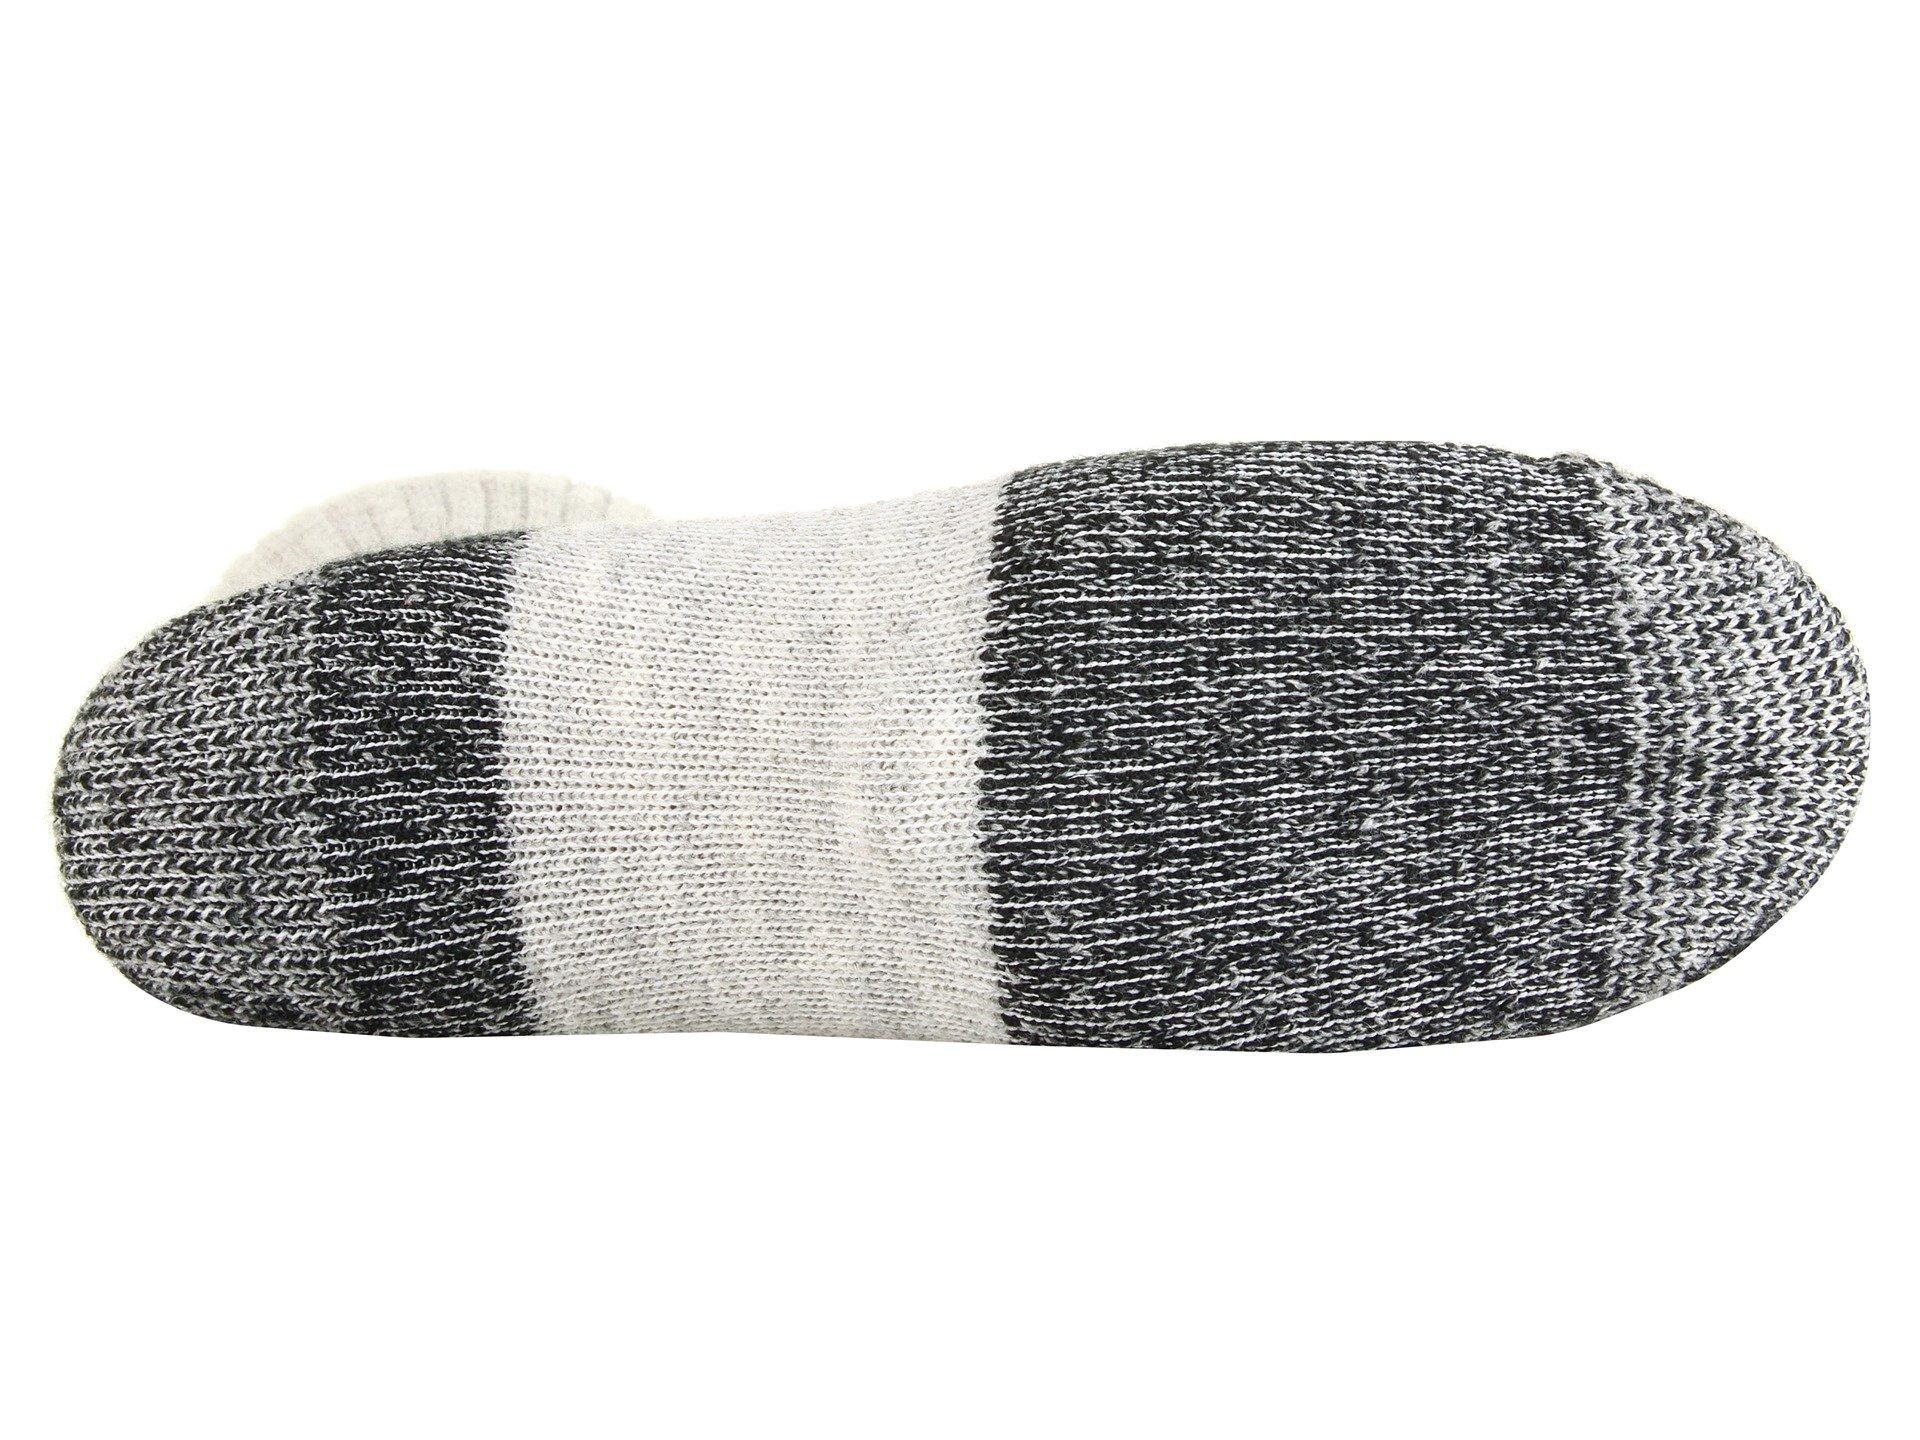 Hiking black Gray pack 3 Wool Cushion Blend Thick Thorlos ZfwqS1x